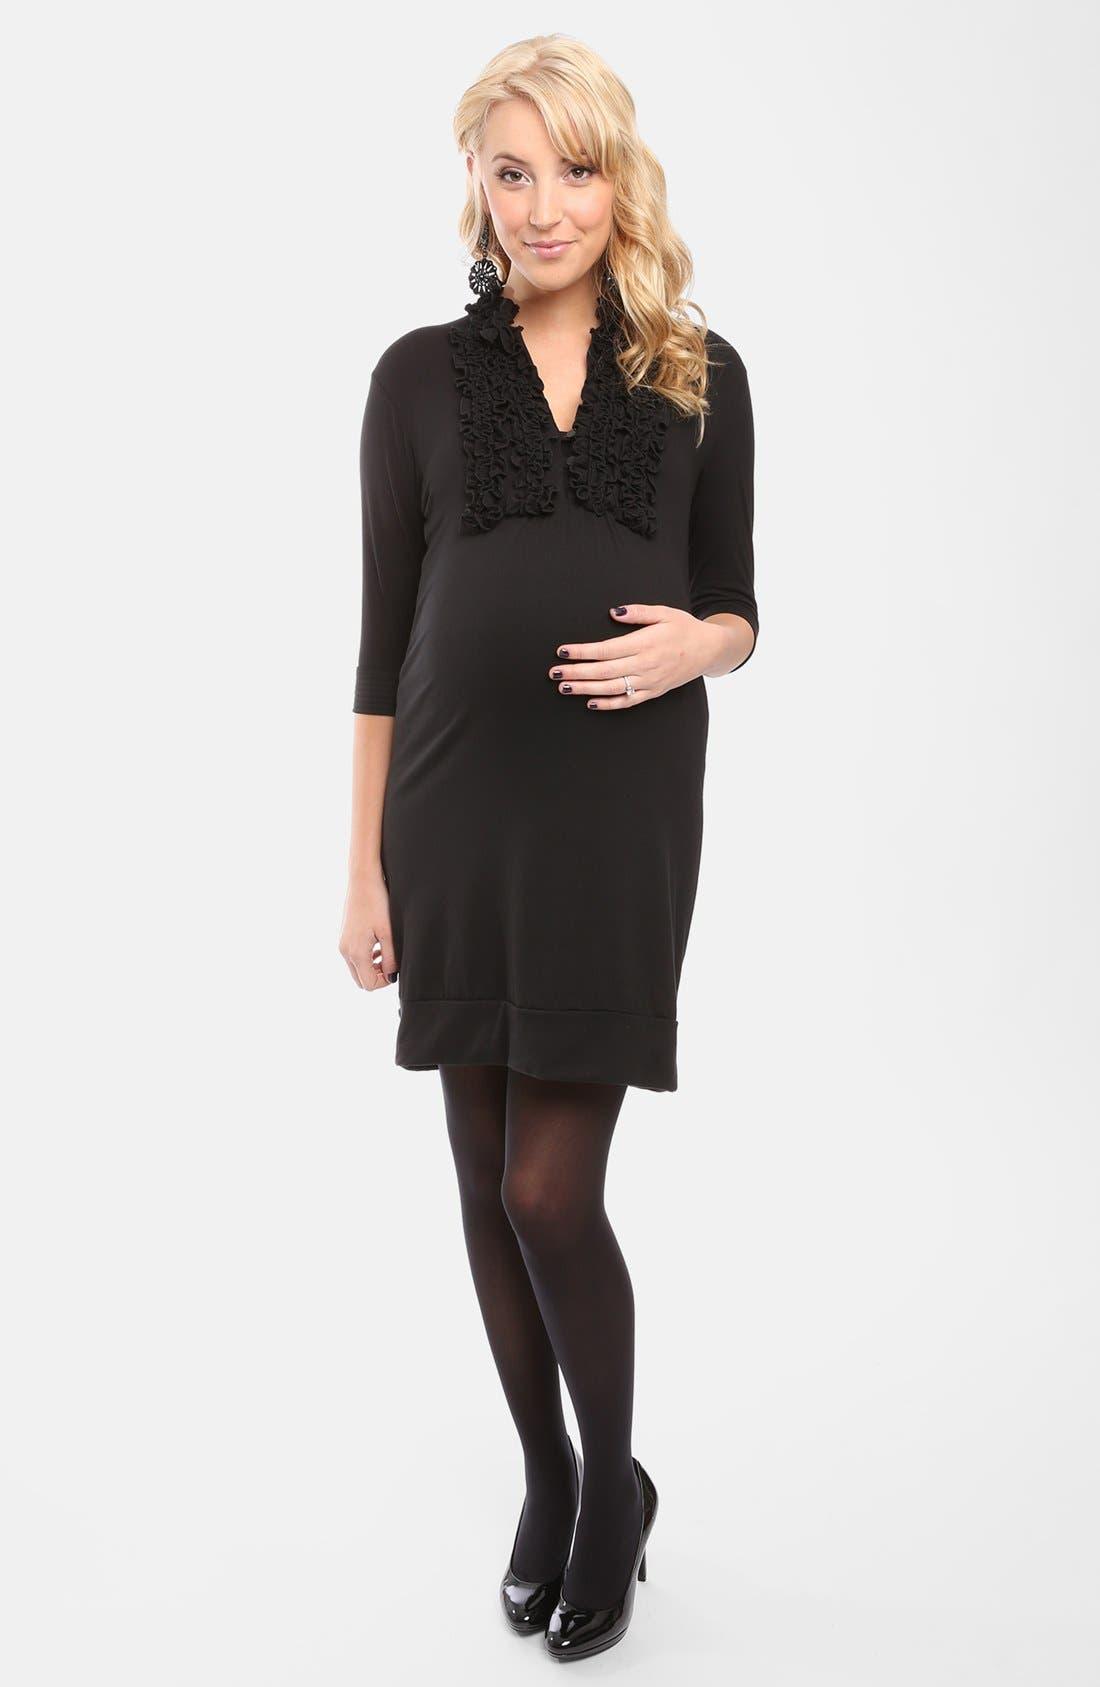 Alternate Image 1 Selected - Everly Grey 'Mattie' Tuxedo Maternity Dress